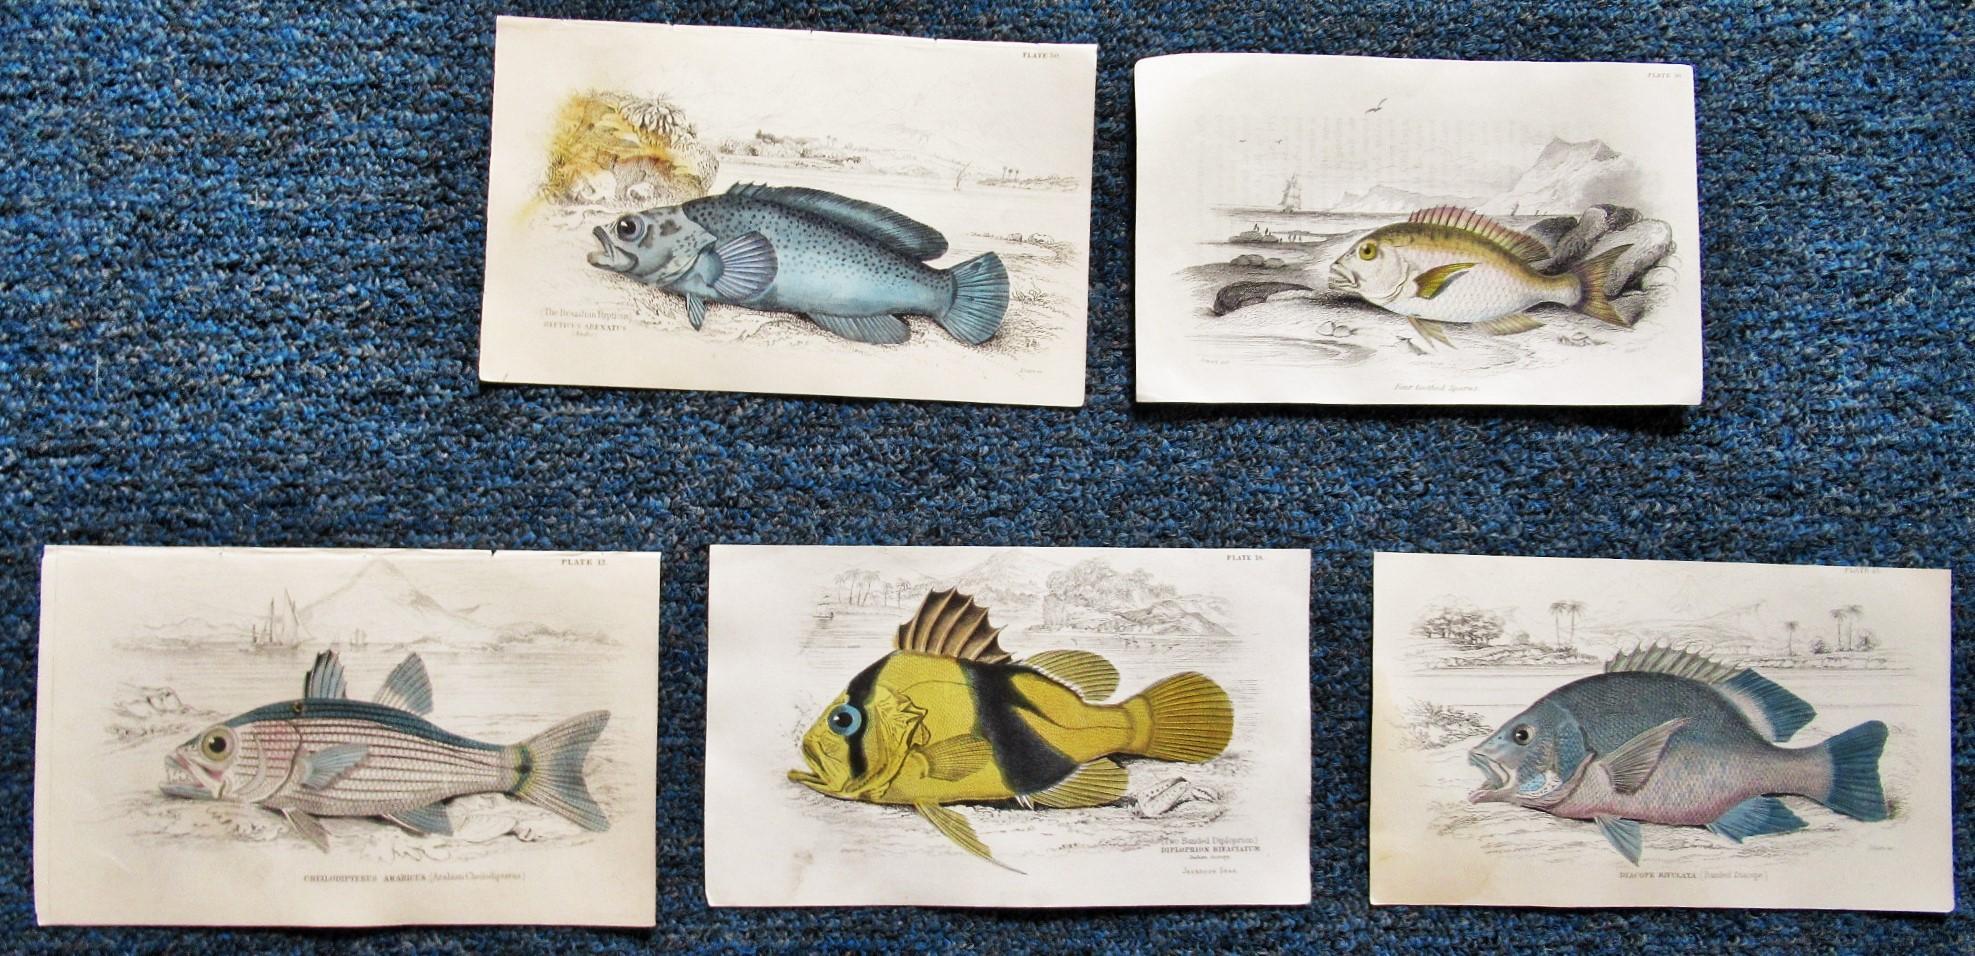 FIVE_5_ORIGINAL_COPPER_PLATE_ENGRAVINGS_OF_FISH__2_JARDINE__LIZARS_Very_Good